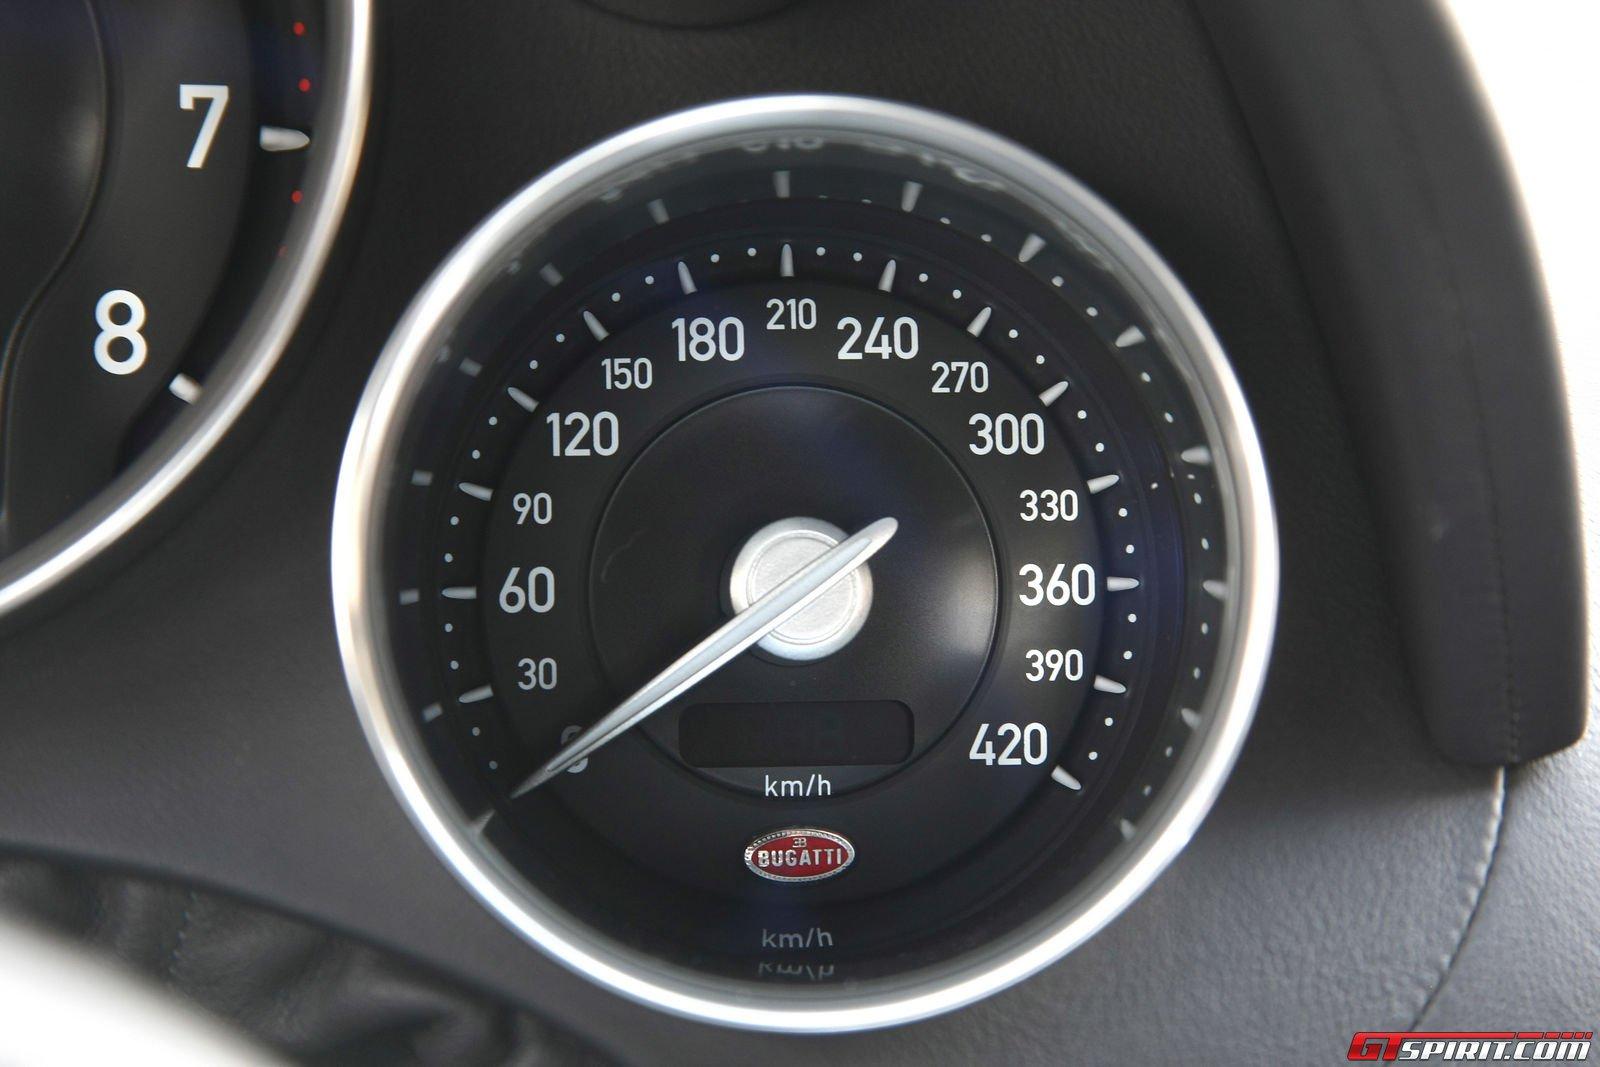 Road Test: Bugatti Veyron 16.4 Review